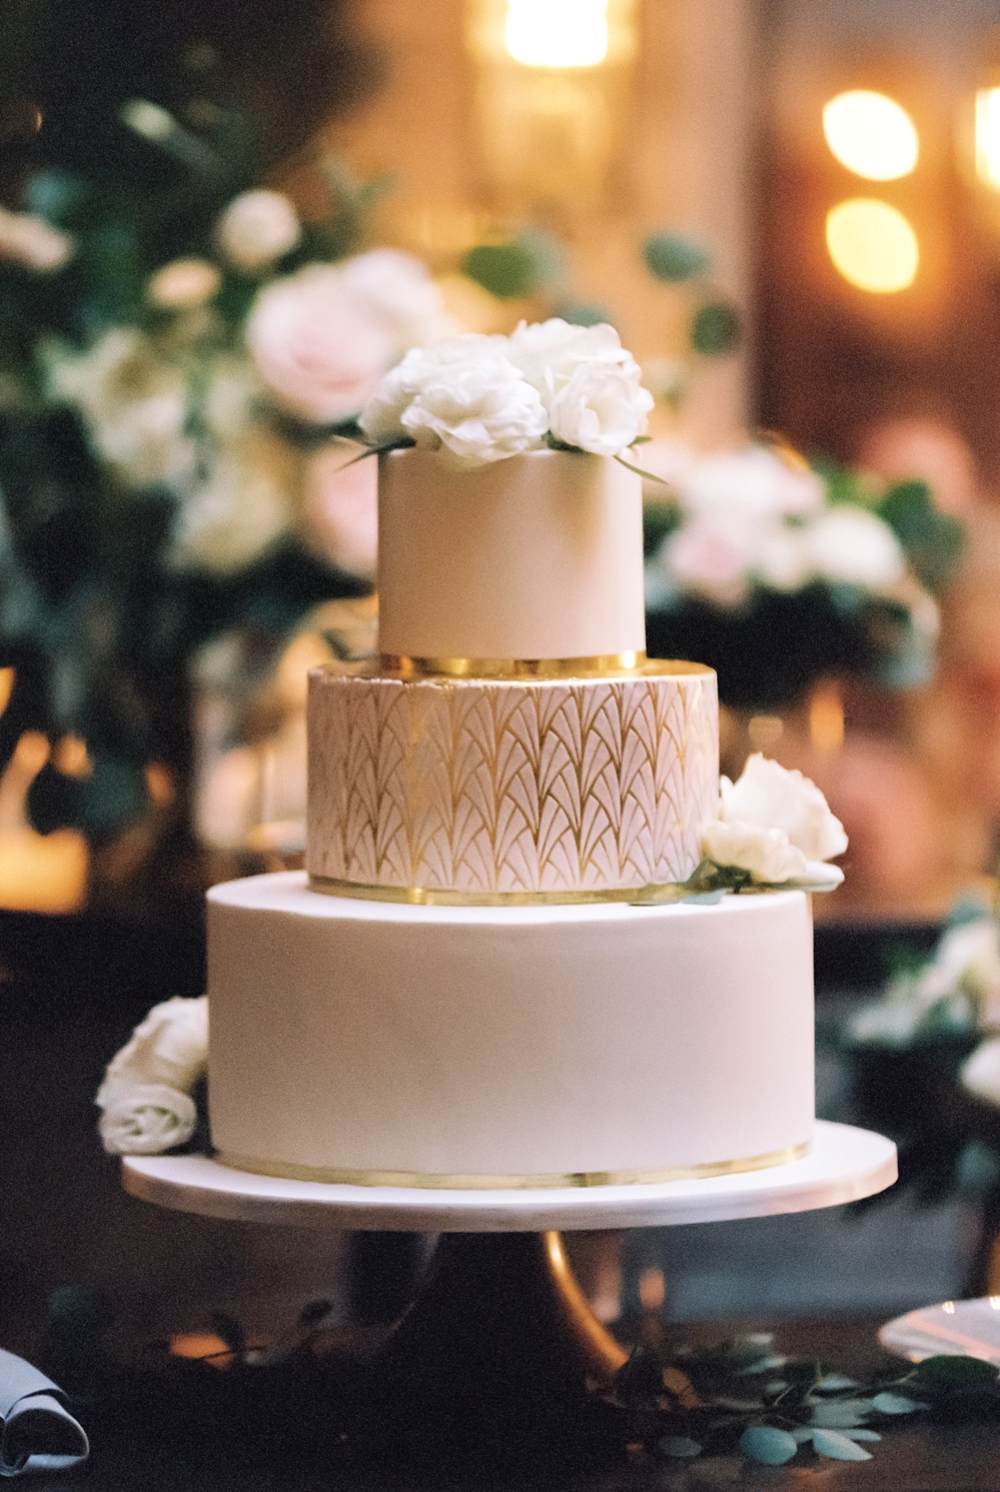 kristin-la-voie-photography-chicago-Wedding-Photographer-kimpton-gray-hotel-1